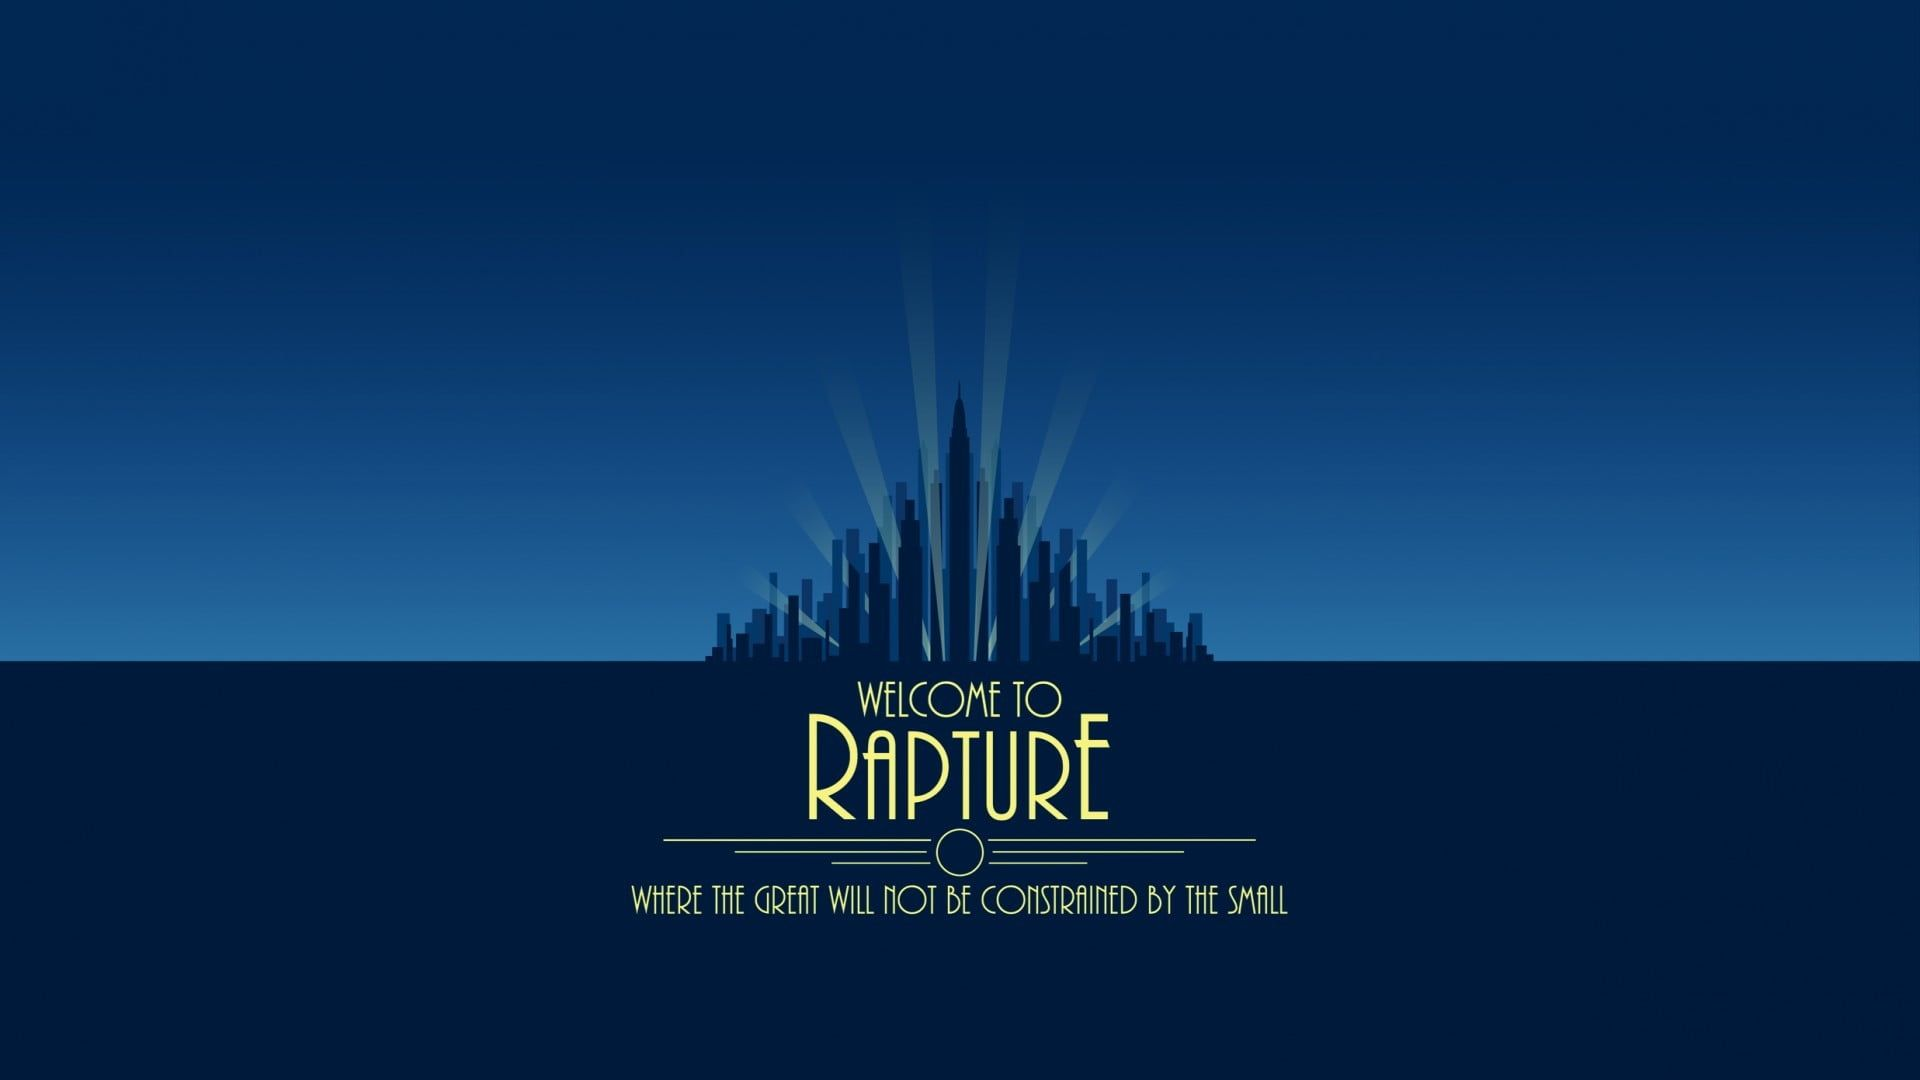 Welcome To Rapture Text Overlay Bioshock 1080p Wallpaper